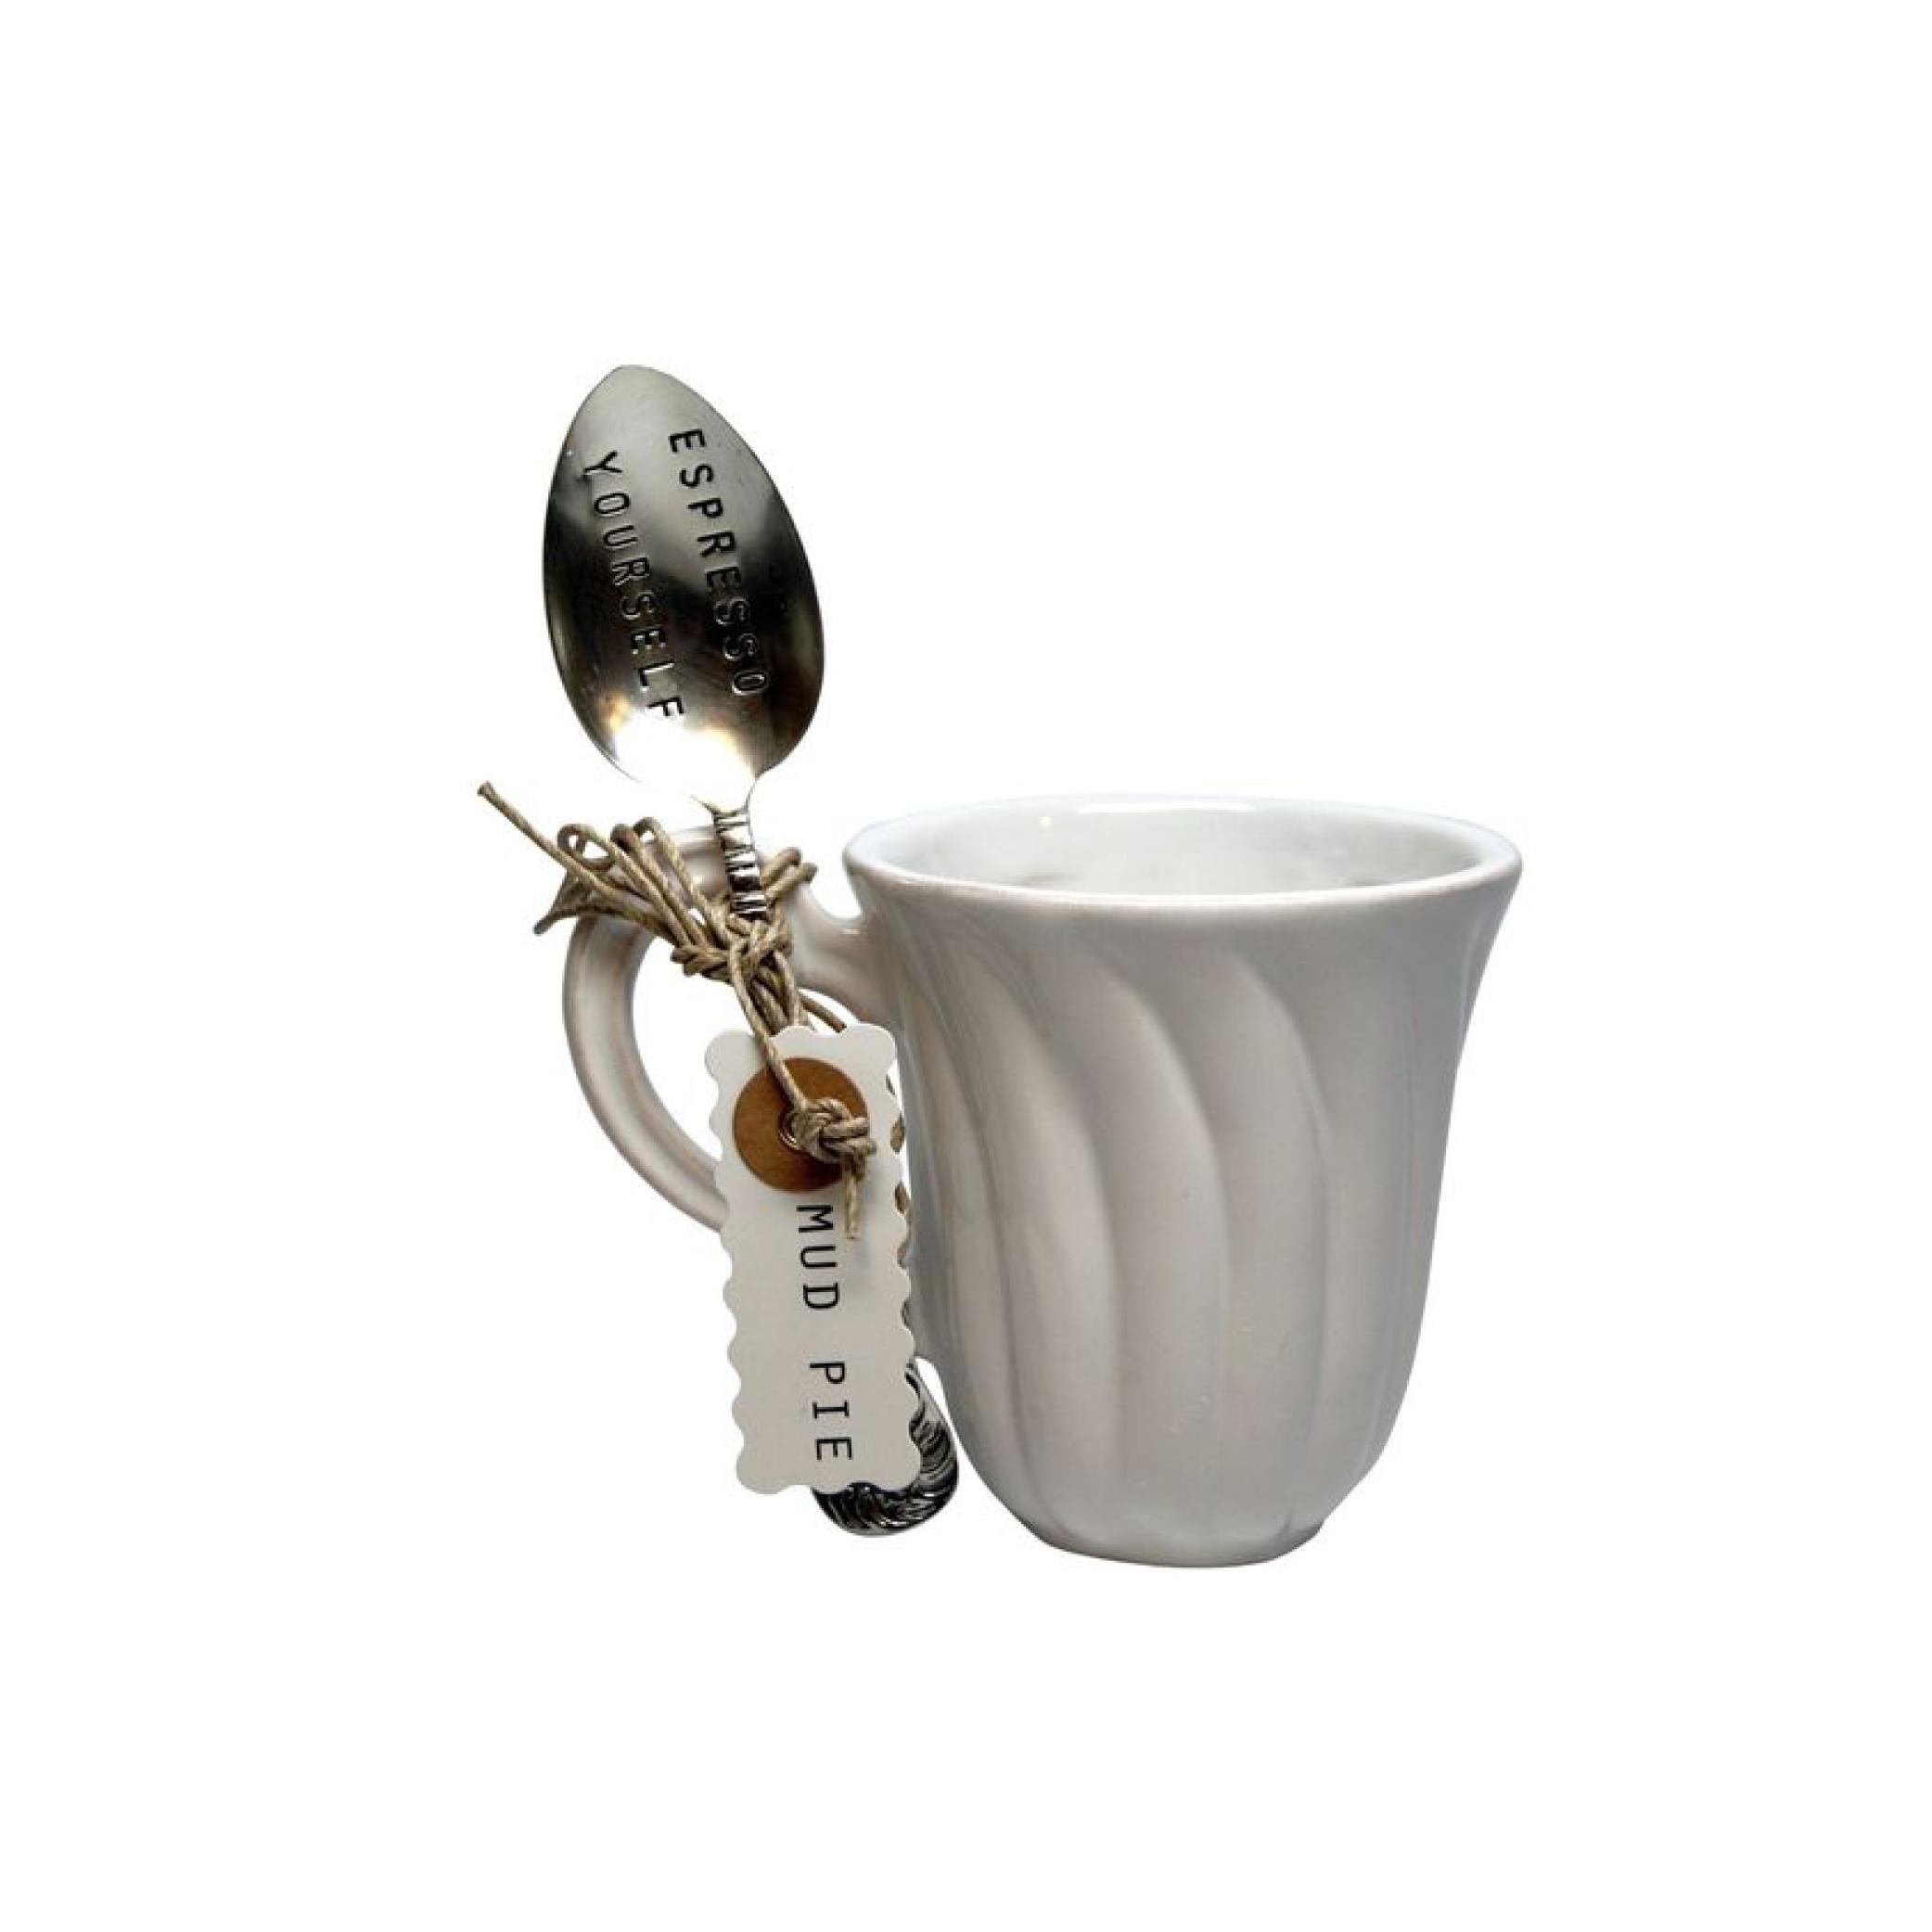 "Mud Pie ""Espresso Yourself"" Coffee Mug and Spoon Set $16.95   Wants 1 Has 0 Needs 1"